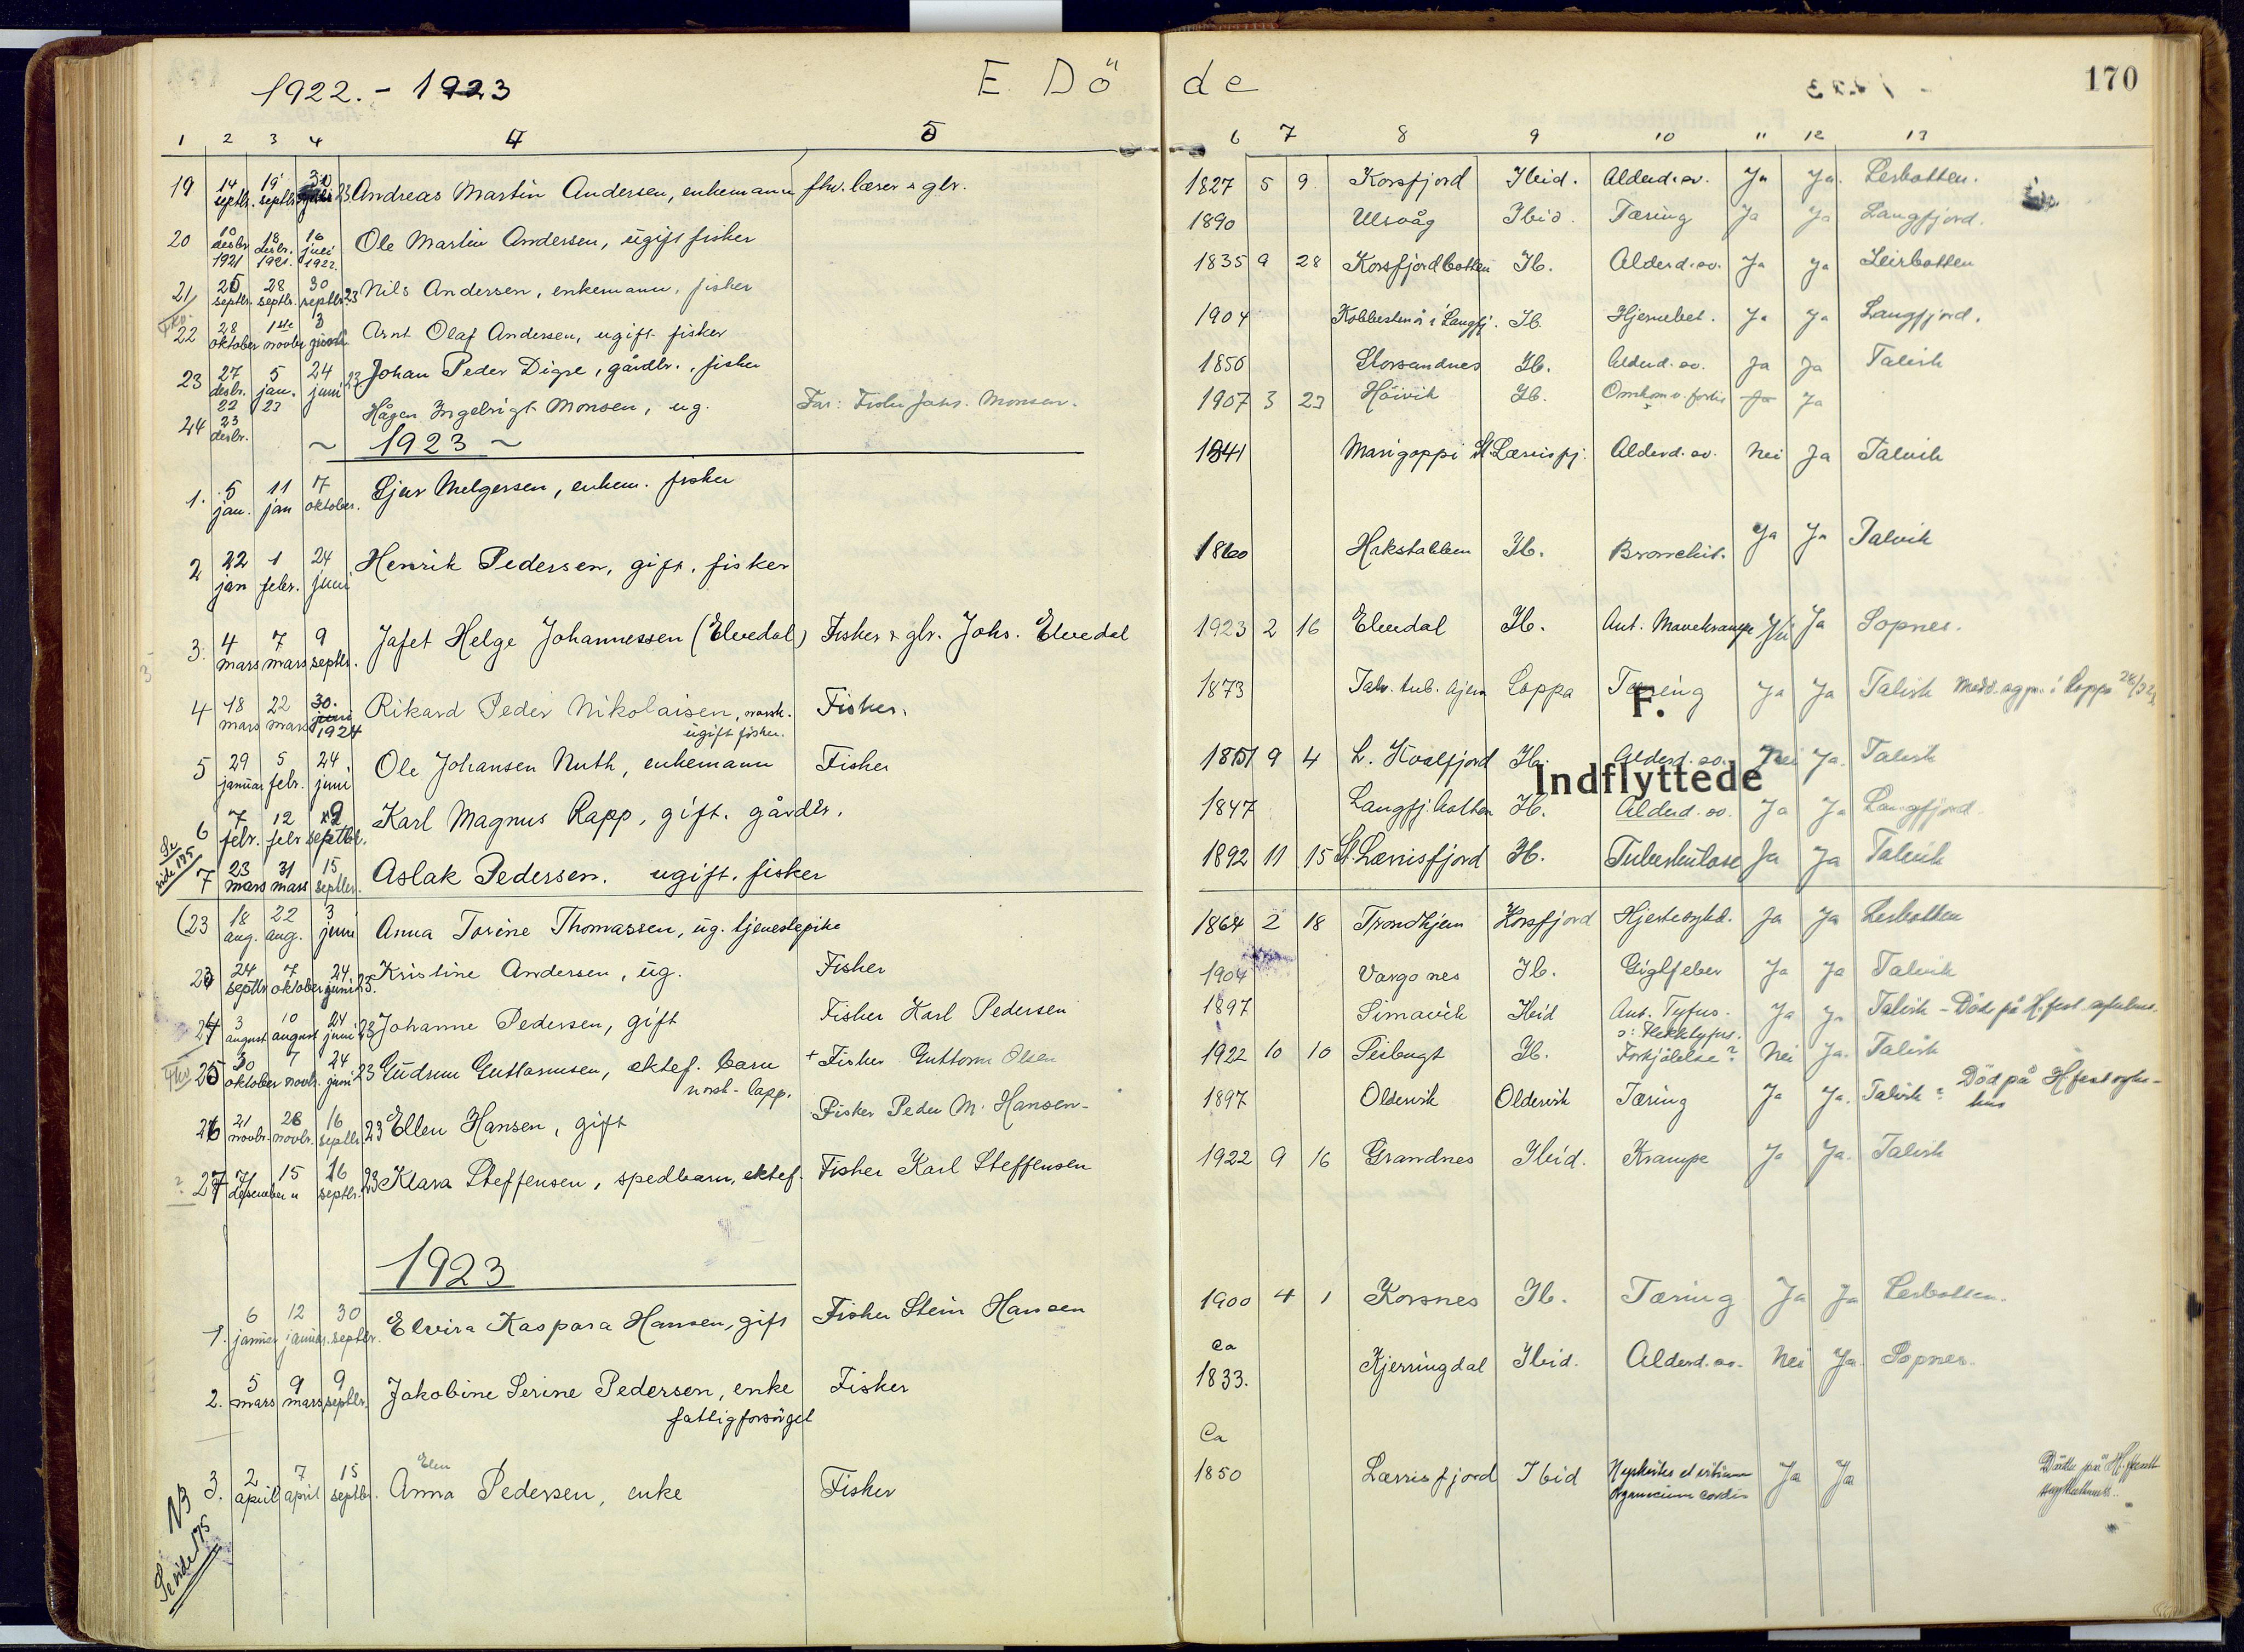 SATØ, Talvik sokneprestkontor, H/Ha/L0018kirke: Ministerialbok nr. 18, 1915-1924, s. 170